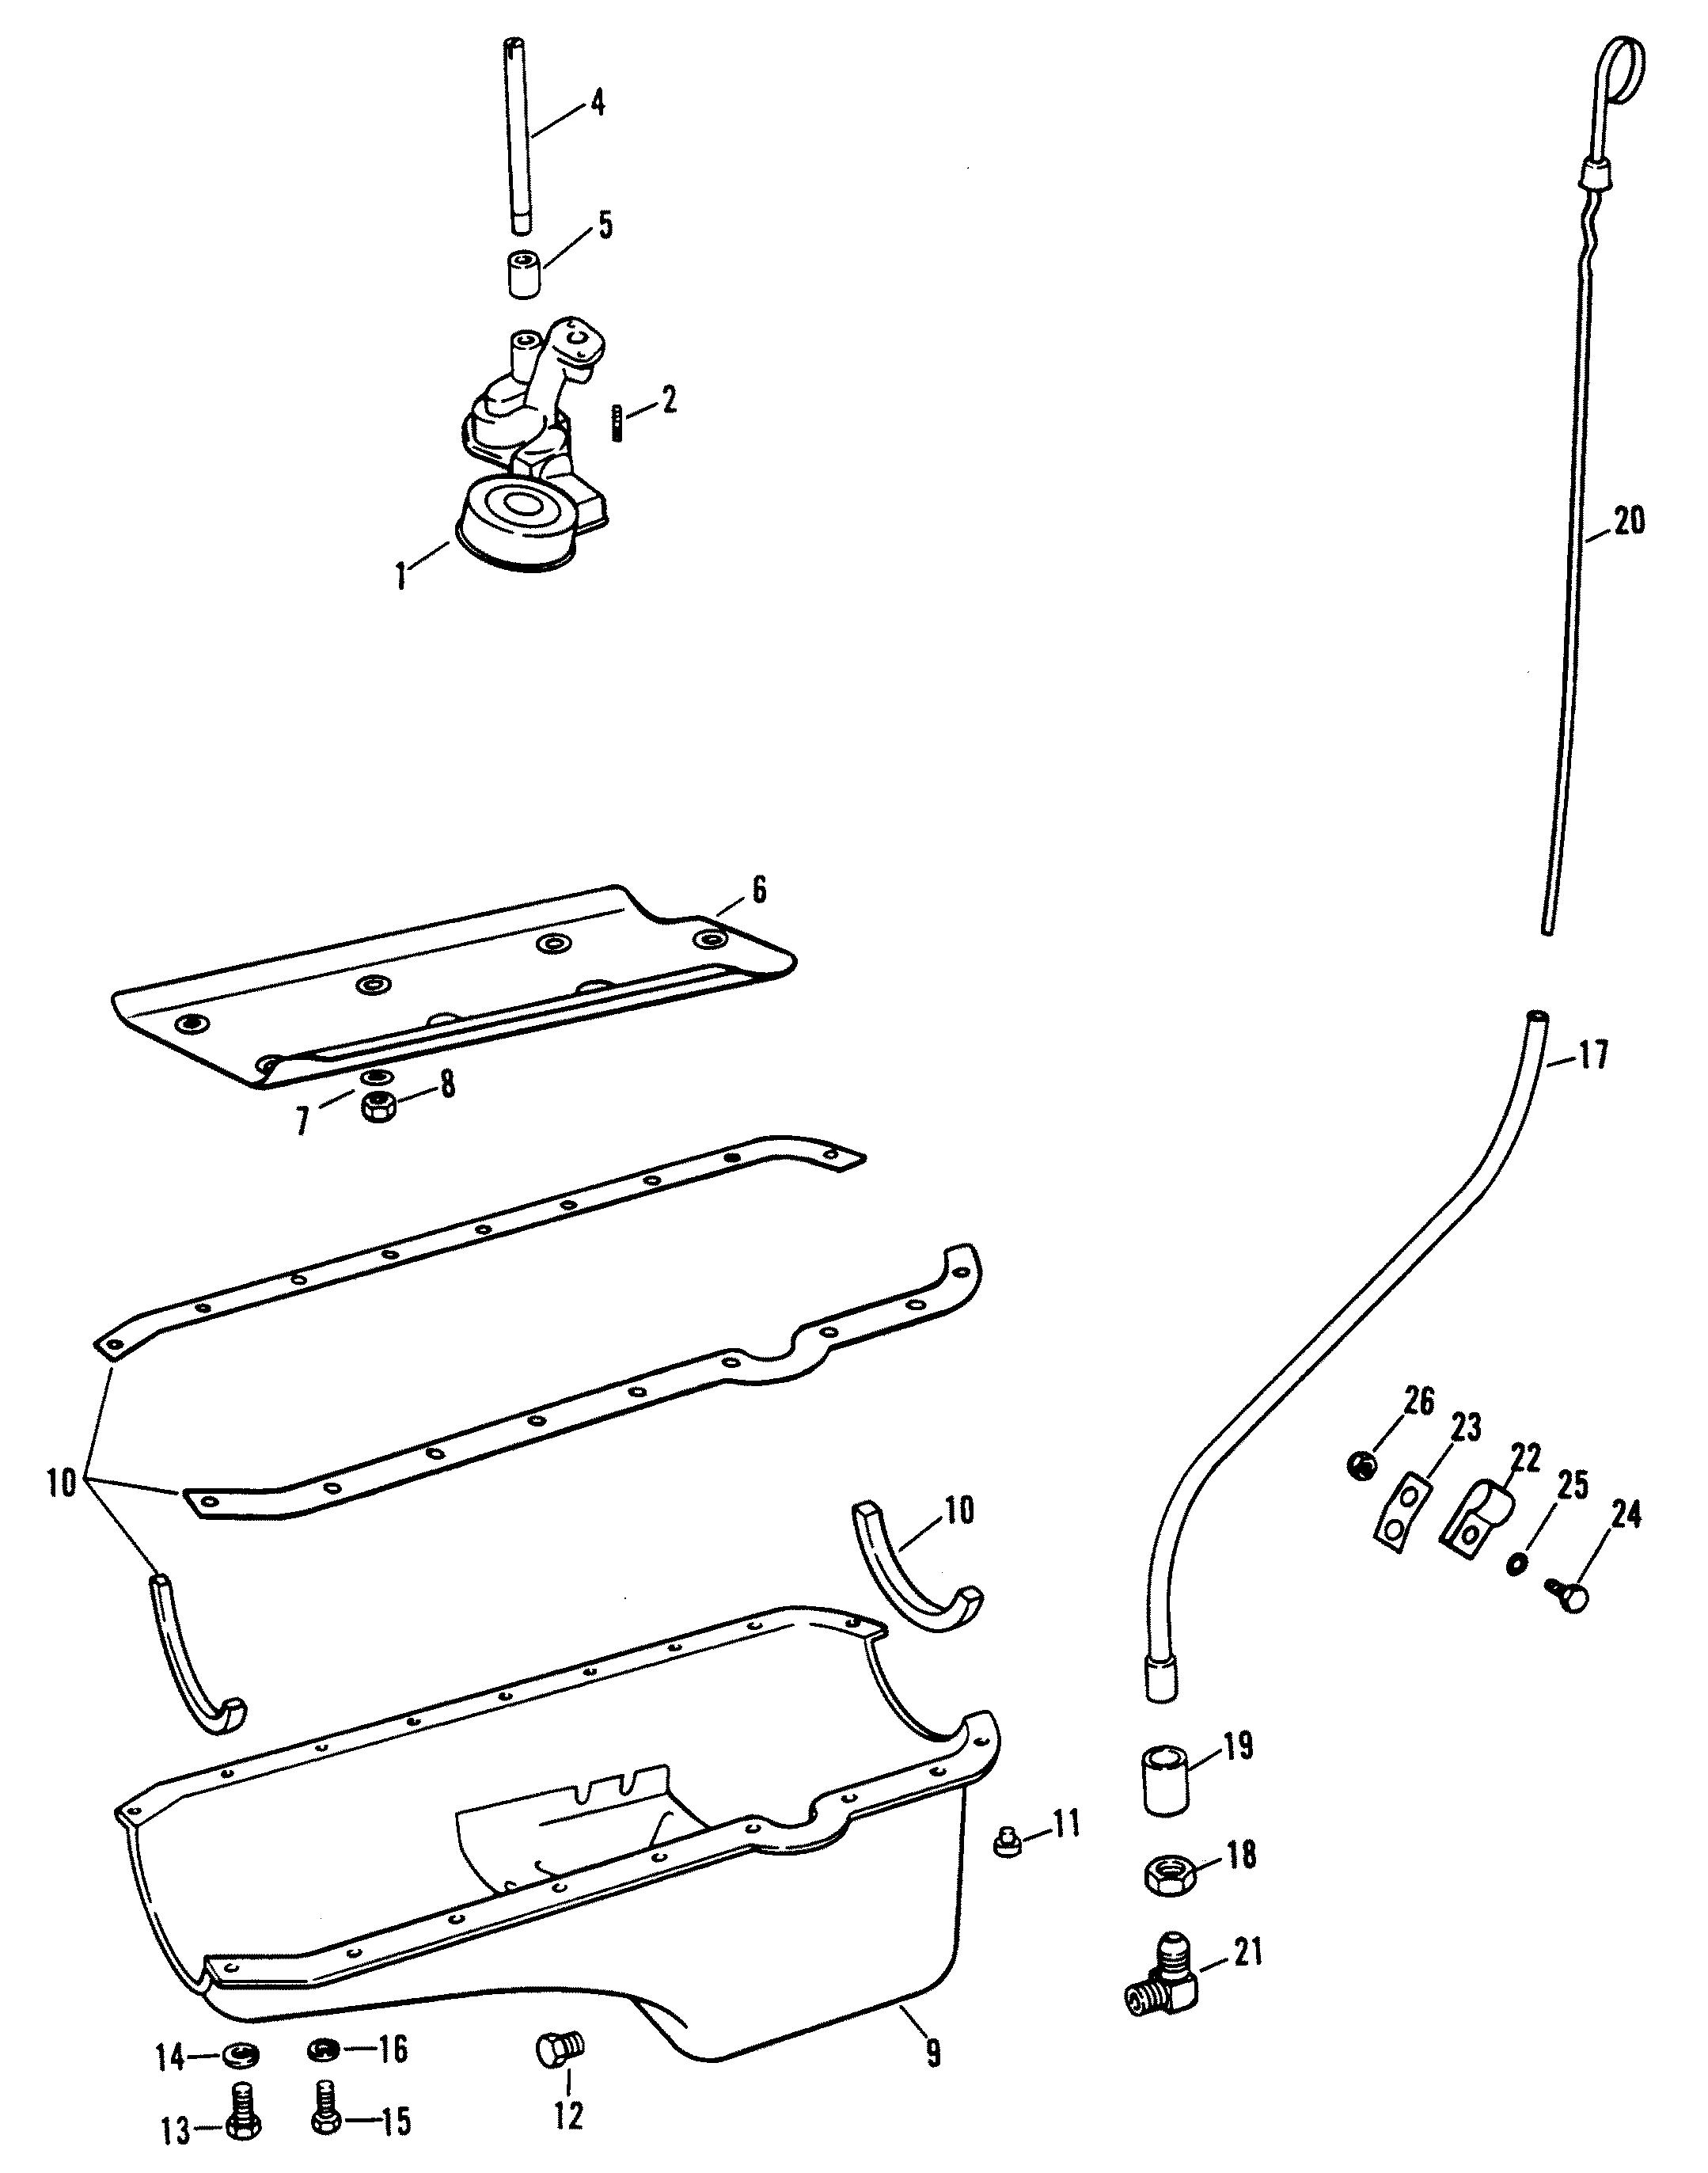 Oil Pan And Oil Pump Castoil Pan For Mercruiser 454 Magnum